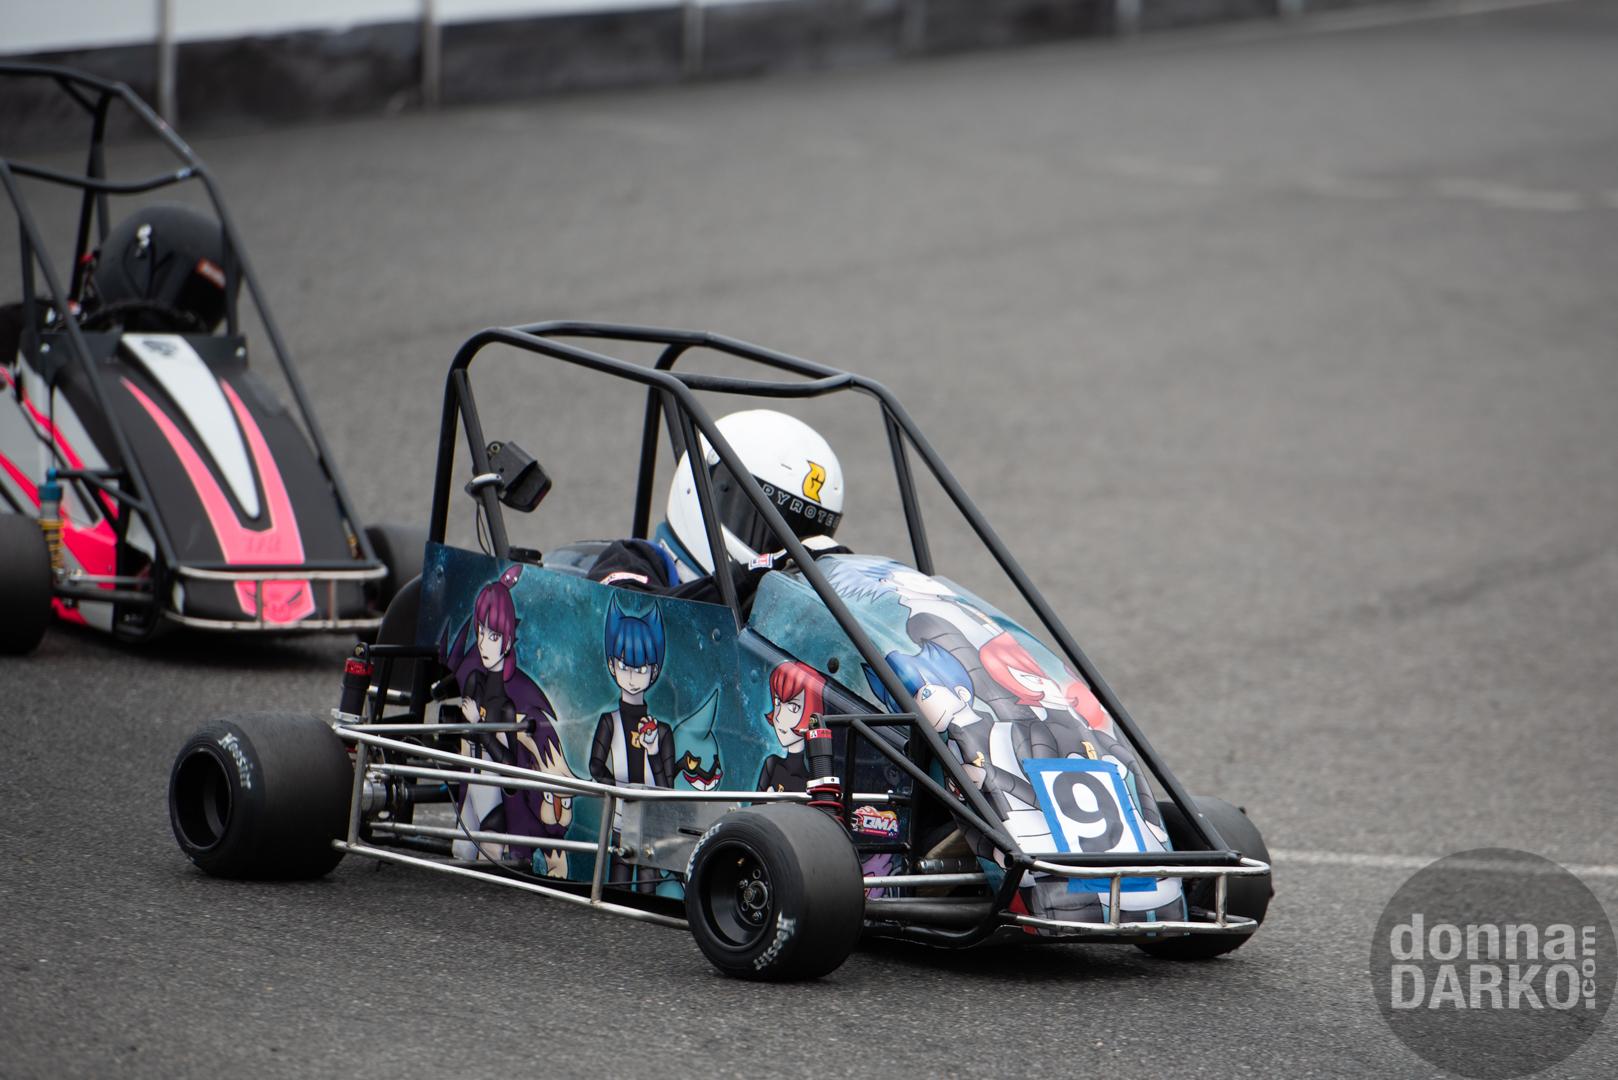 QWMA (Racing) 8-11-2019 DSC_6414.jpg